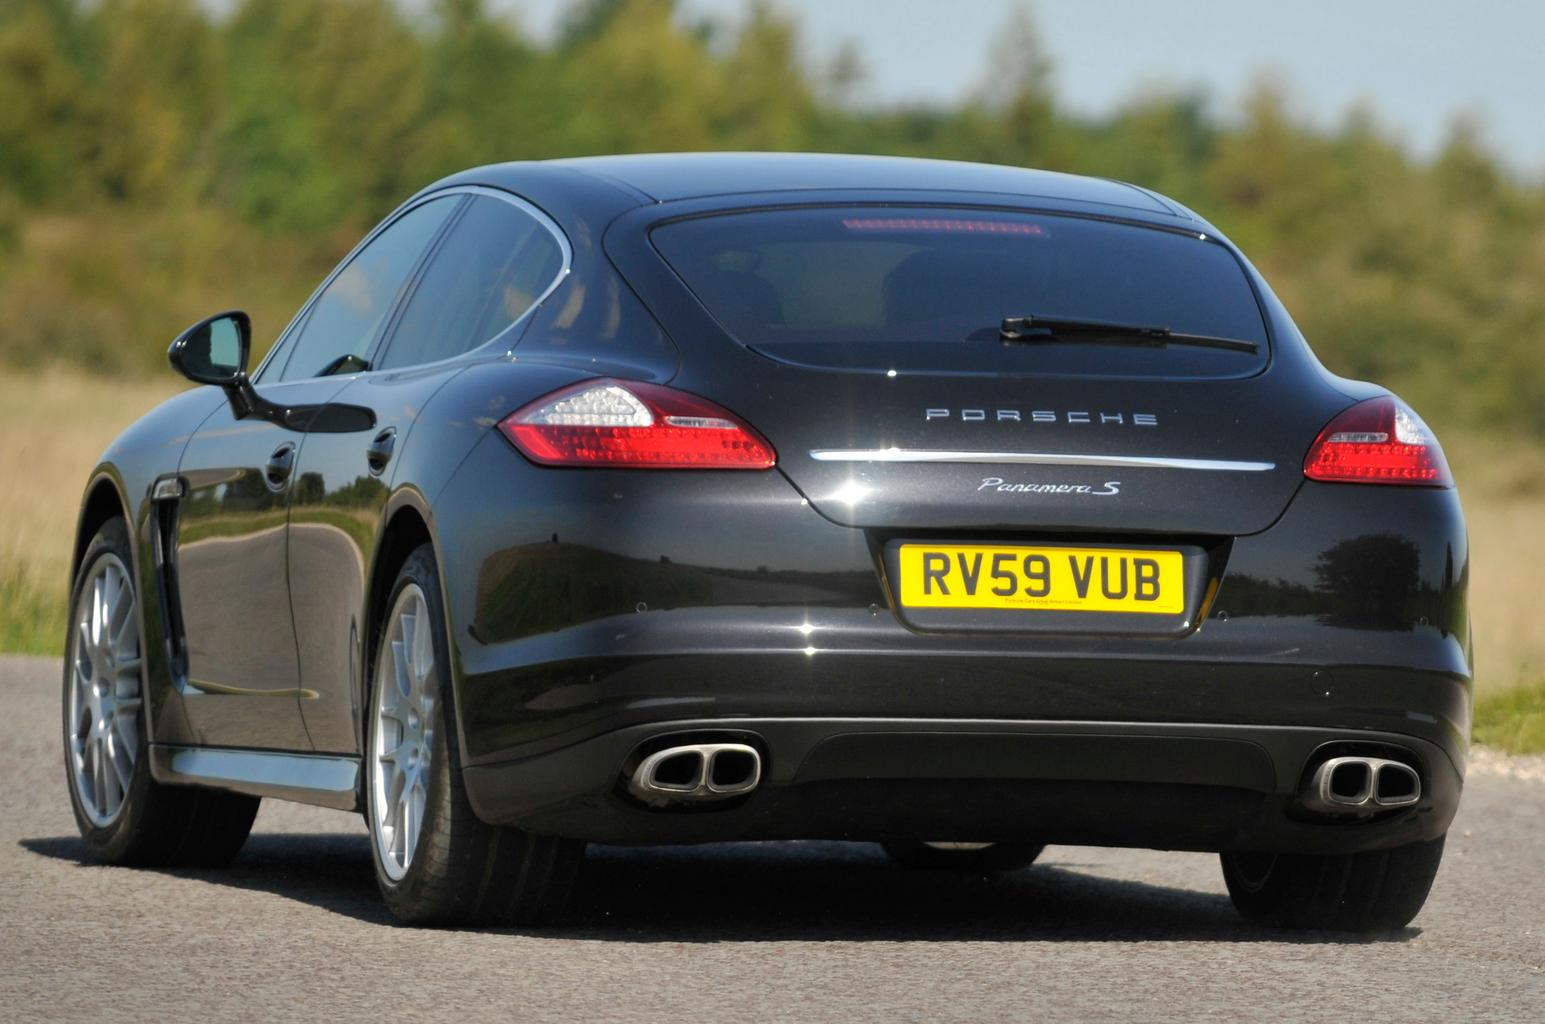 Used test: Porsche Panamera vs Jaguar XFR